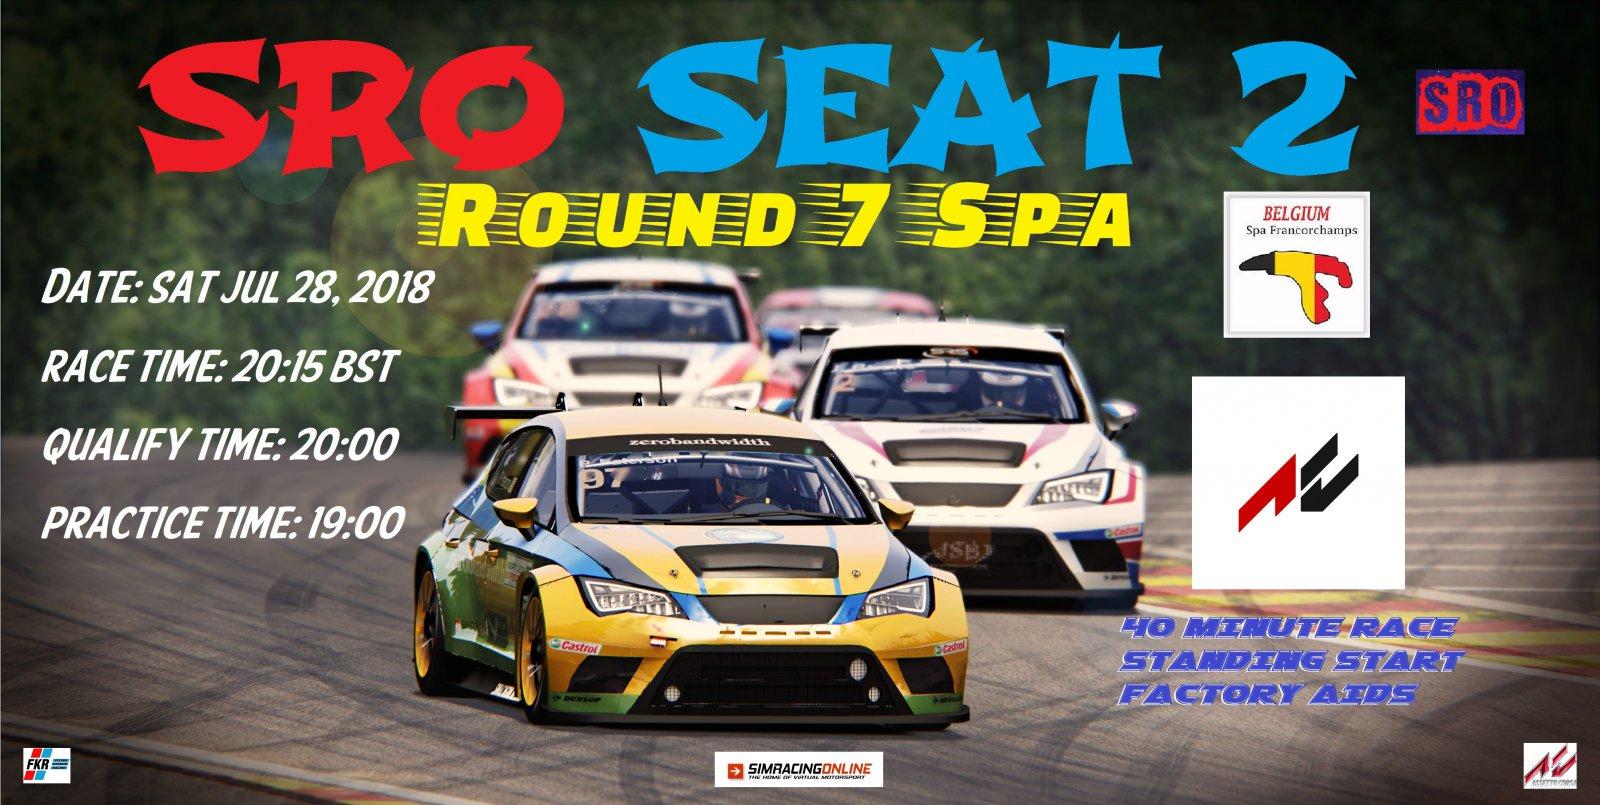 SEAT 2 R 7.jpg